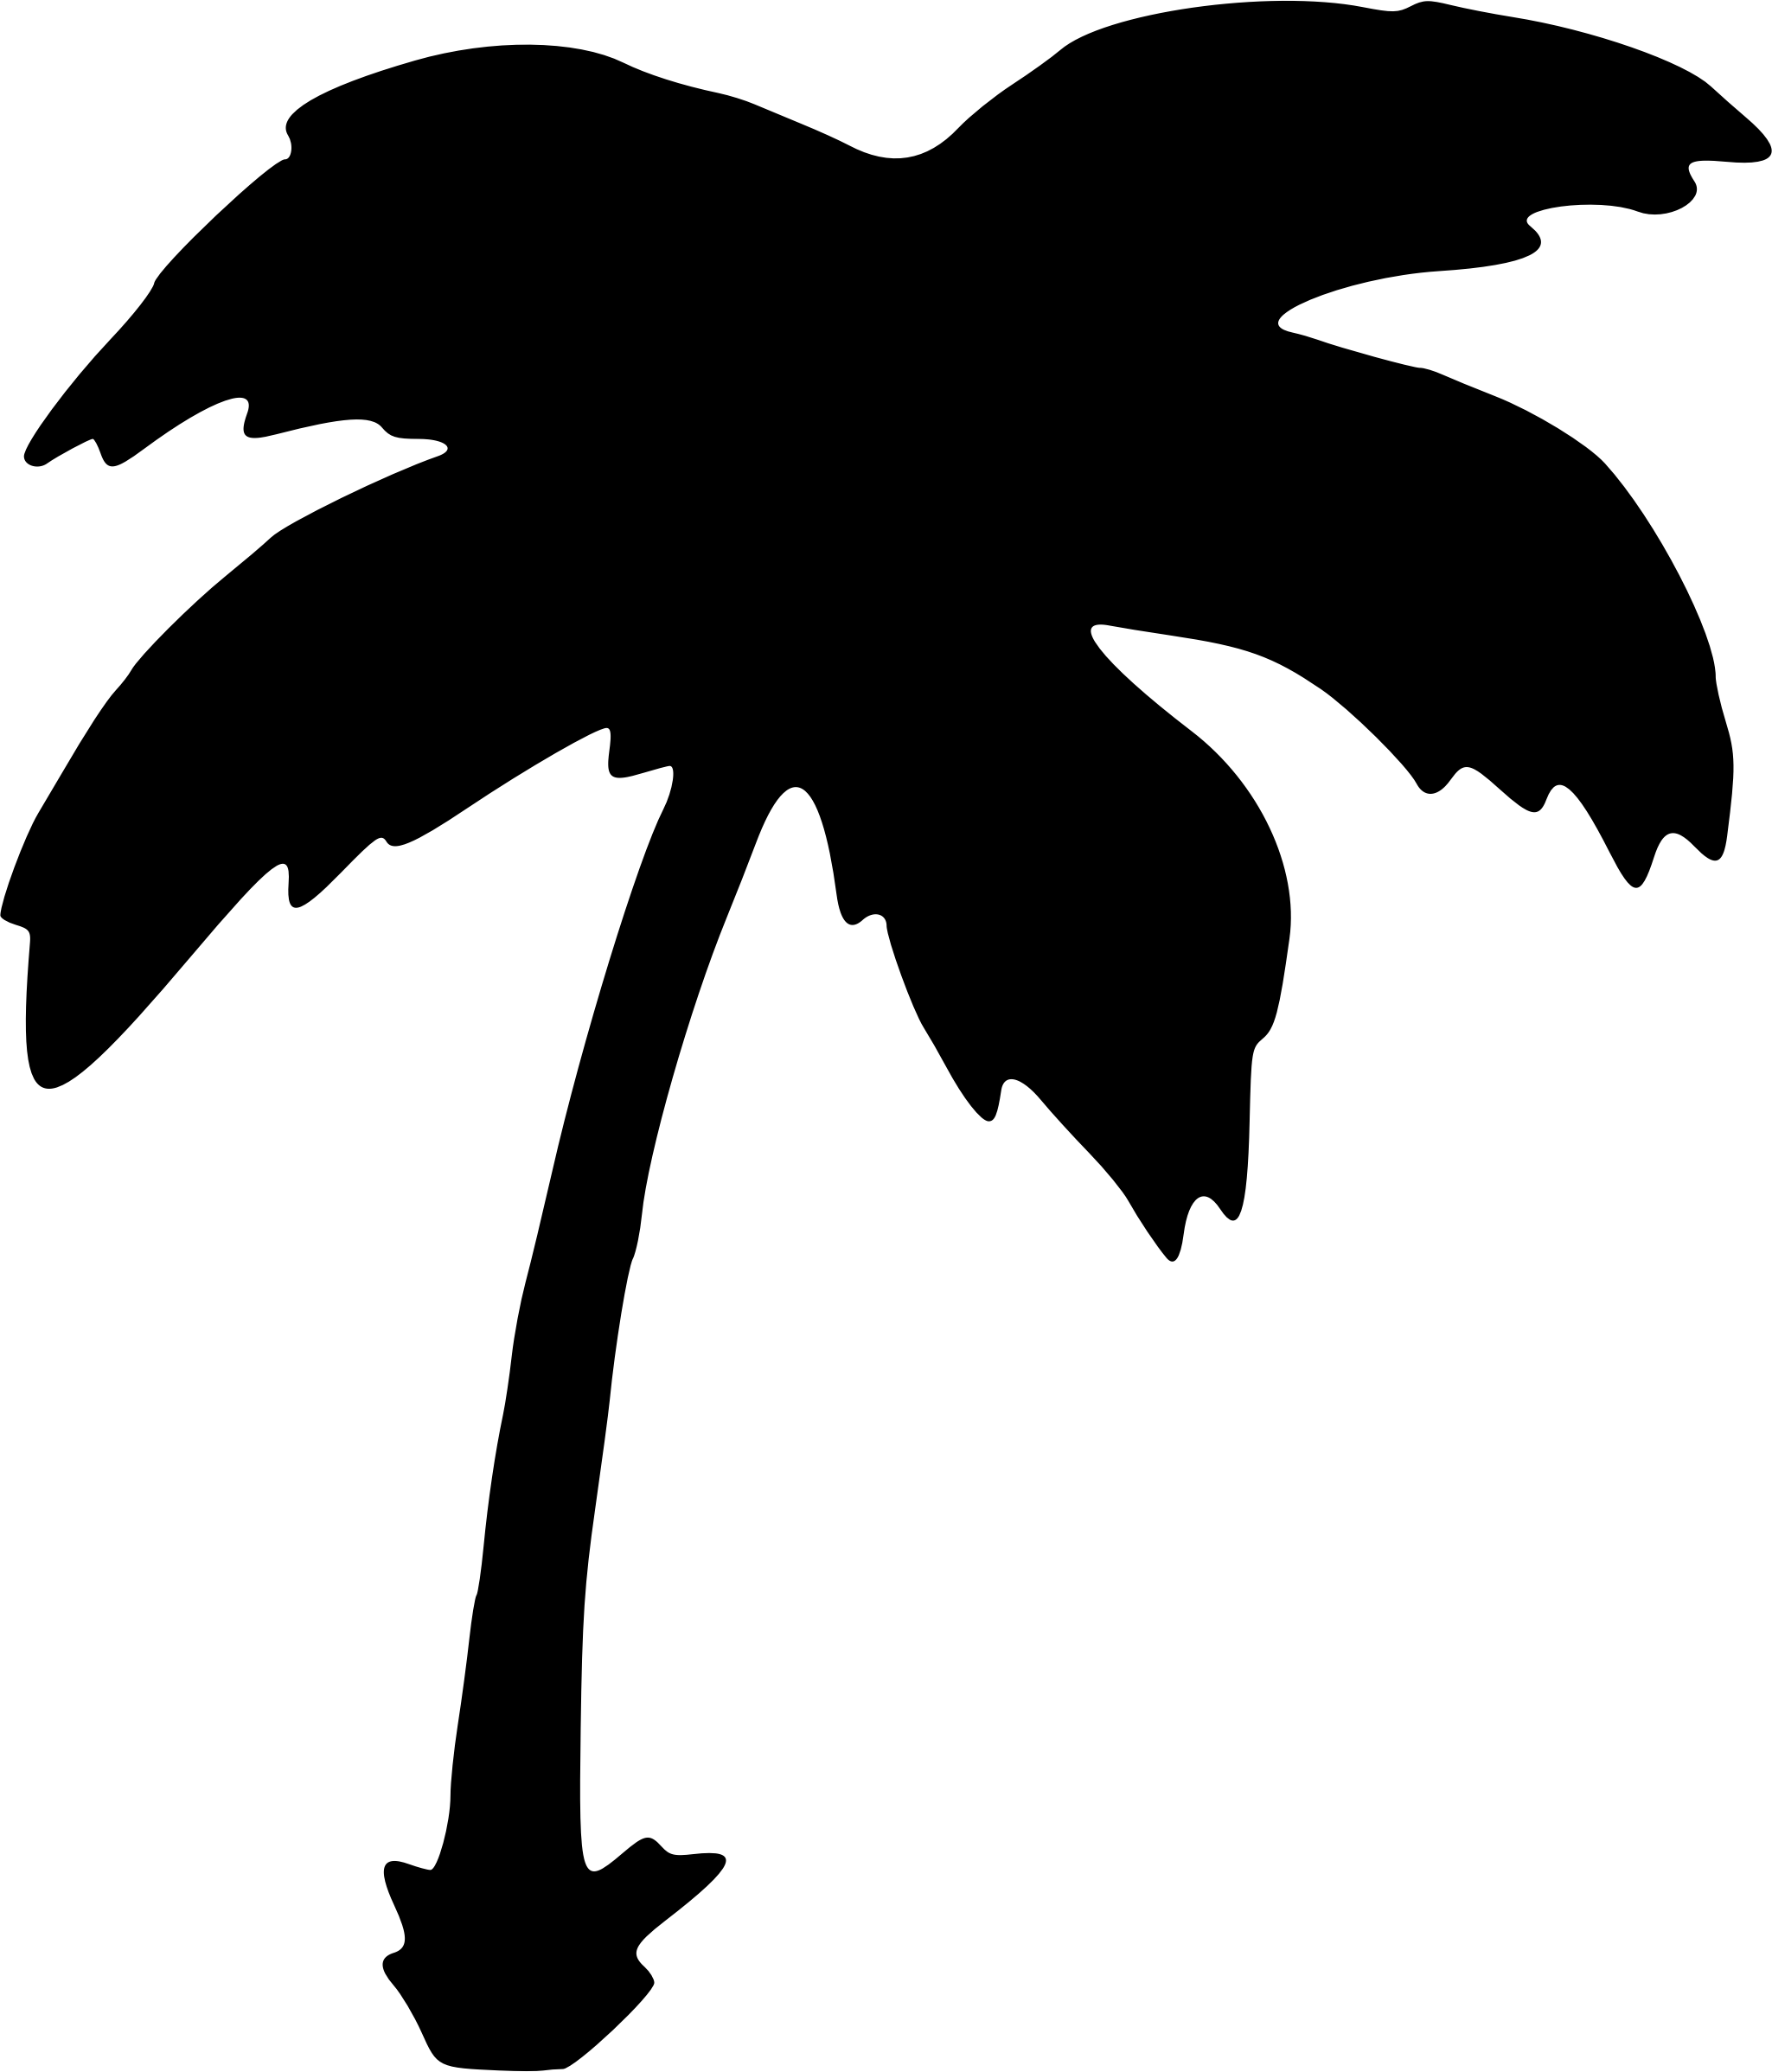 2049x2396 Clipart